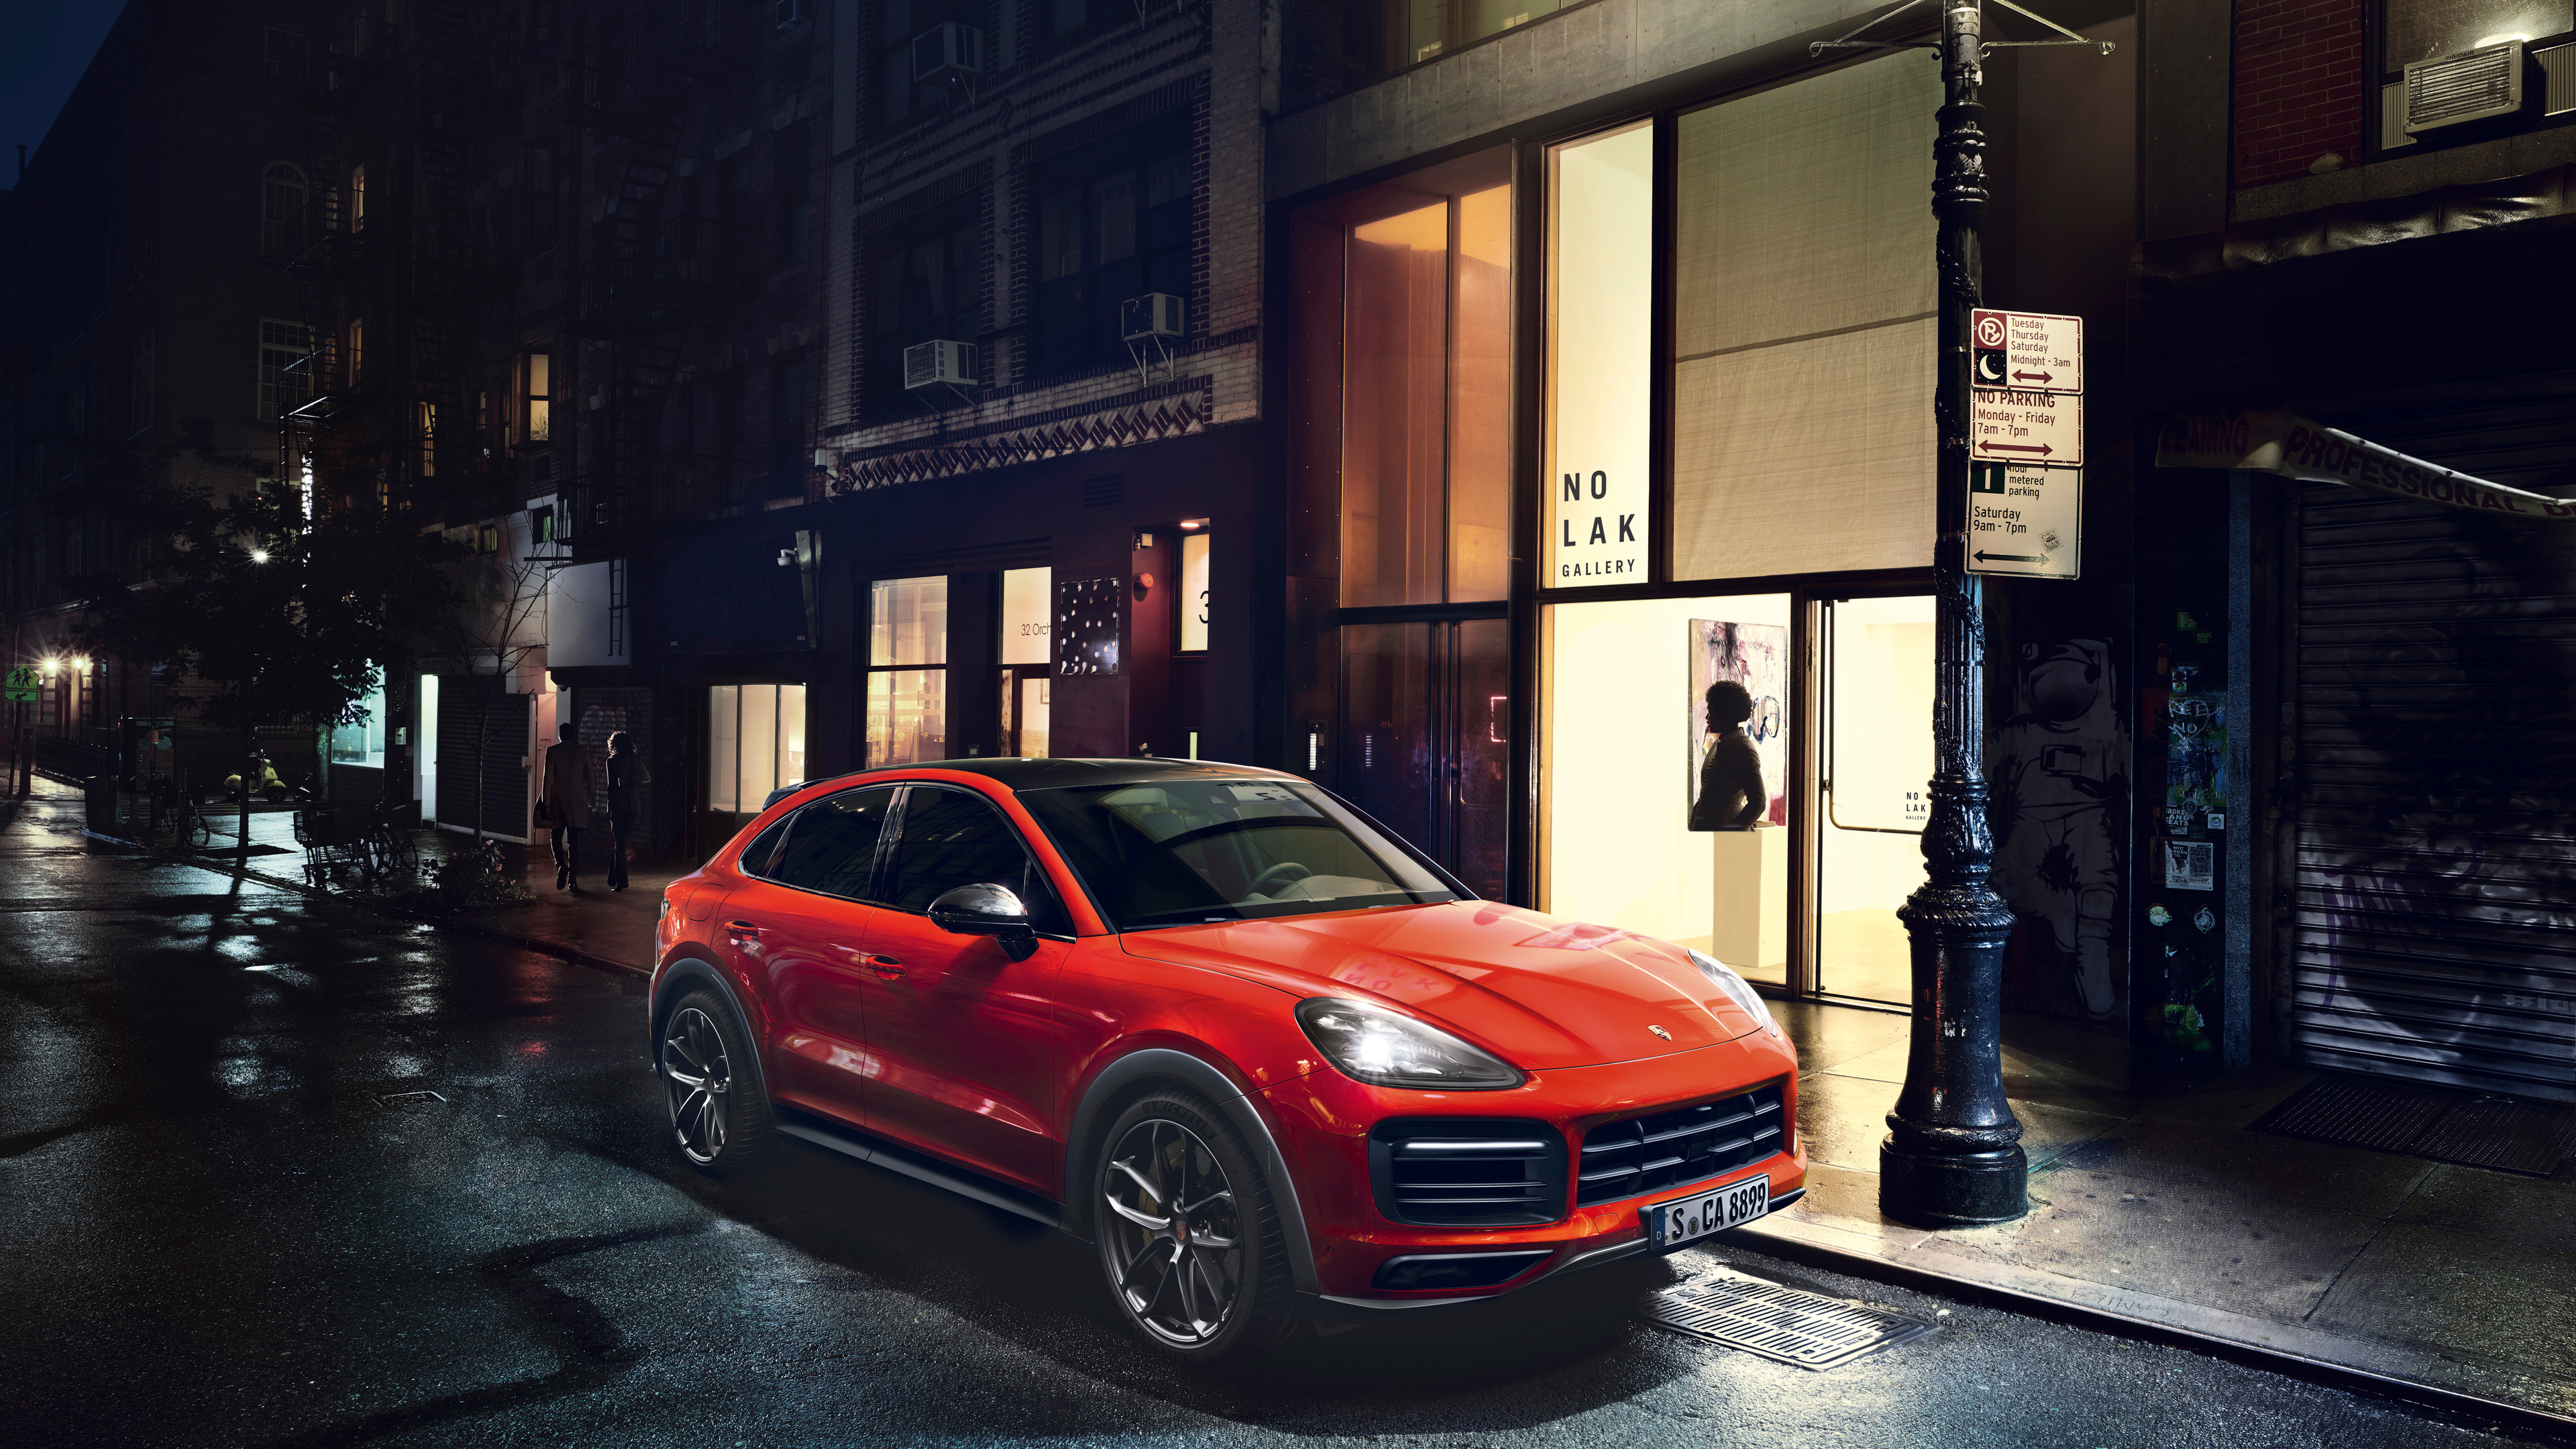 2019 porsche cayenne coupe 4k 1554245321 - 2019 Porsche Cayenne Coupe 4k - porsche wallpapers, porsche cayenne wallpapers, hd-wallpapers, cars wallpapers, 5k wallpapers, 4k-wallpapers, 2019 cars wallpapers